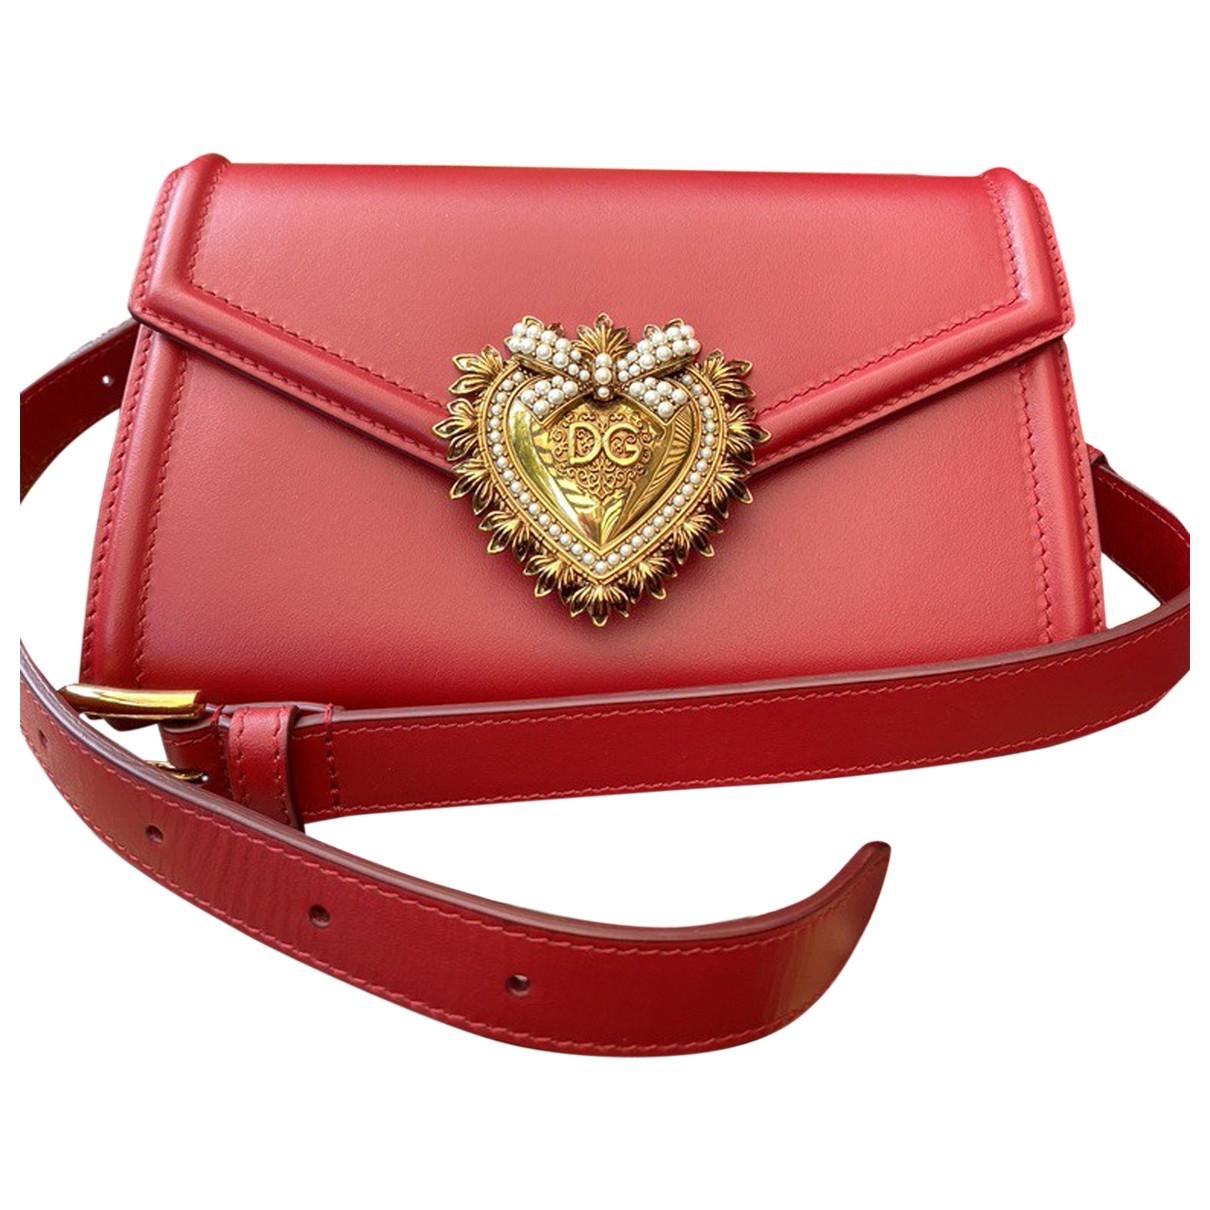 Dolce & Gabbana \N Red Leather Clutch bag for Women \N